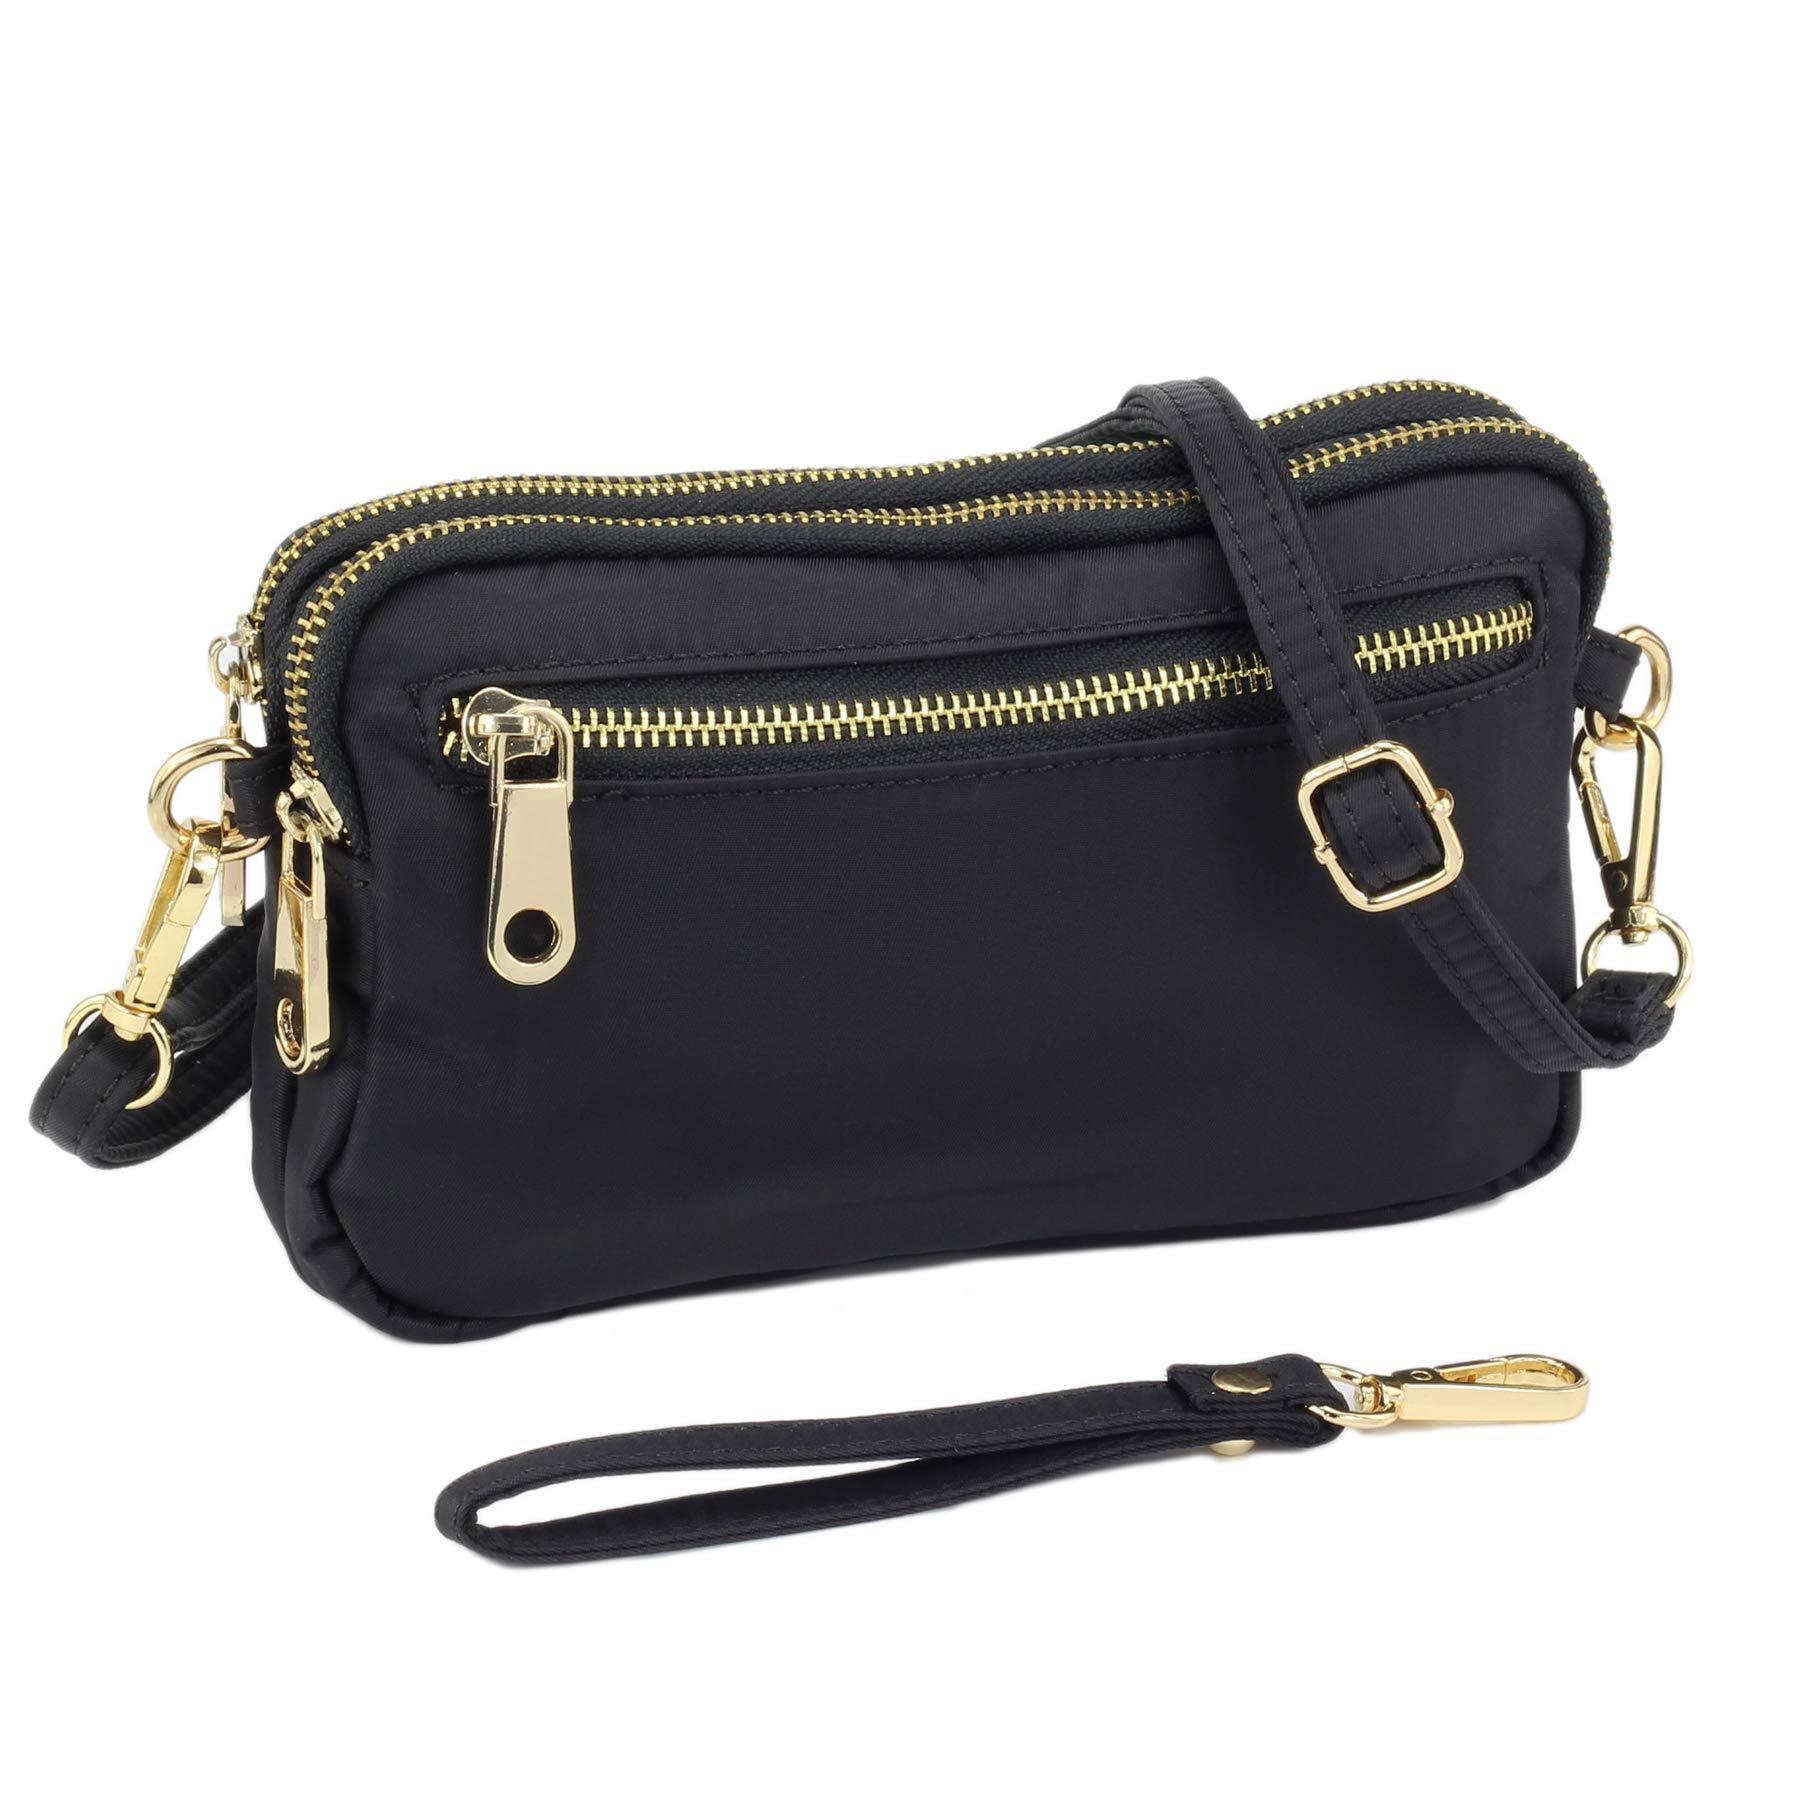 ZORFIN Nylon Small Crossbody Bags for Women Waterproof Cell Phone Purse Wristlet Wallet (ZF181109HO-BL)